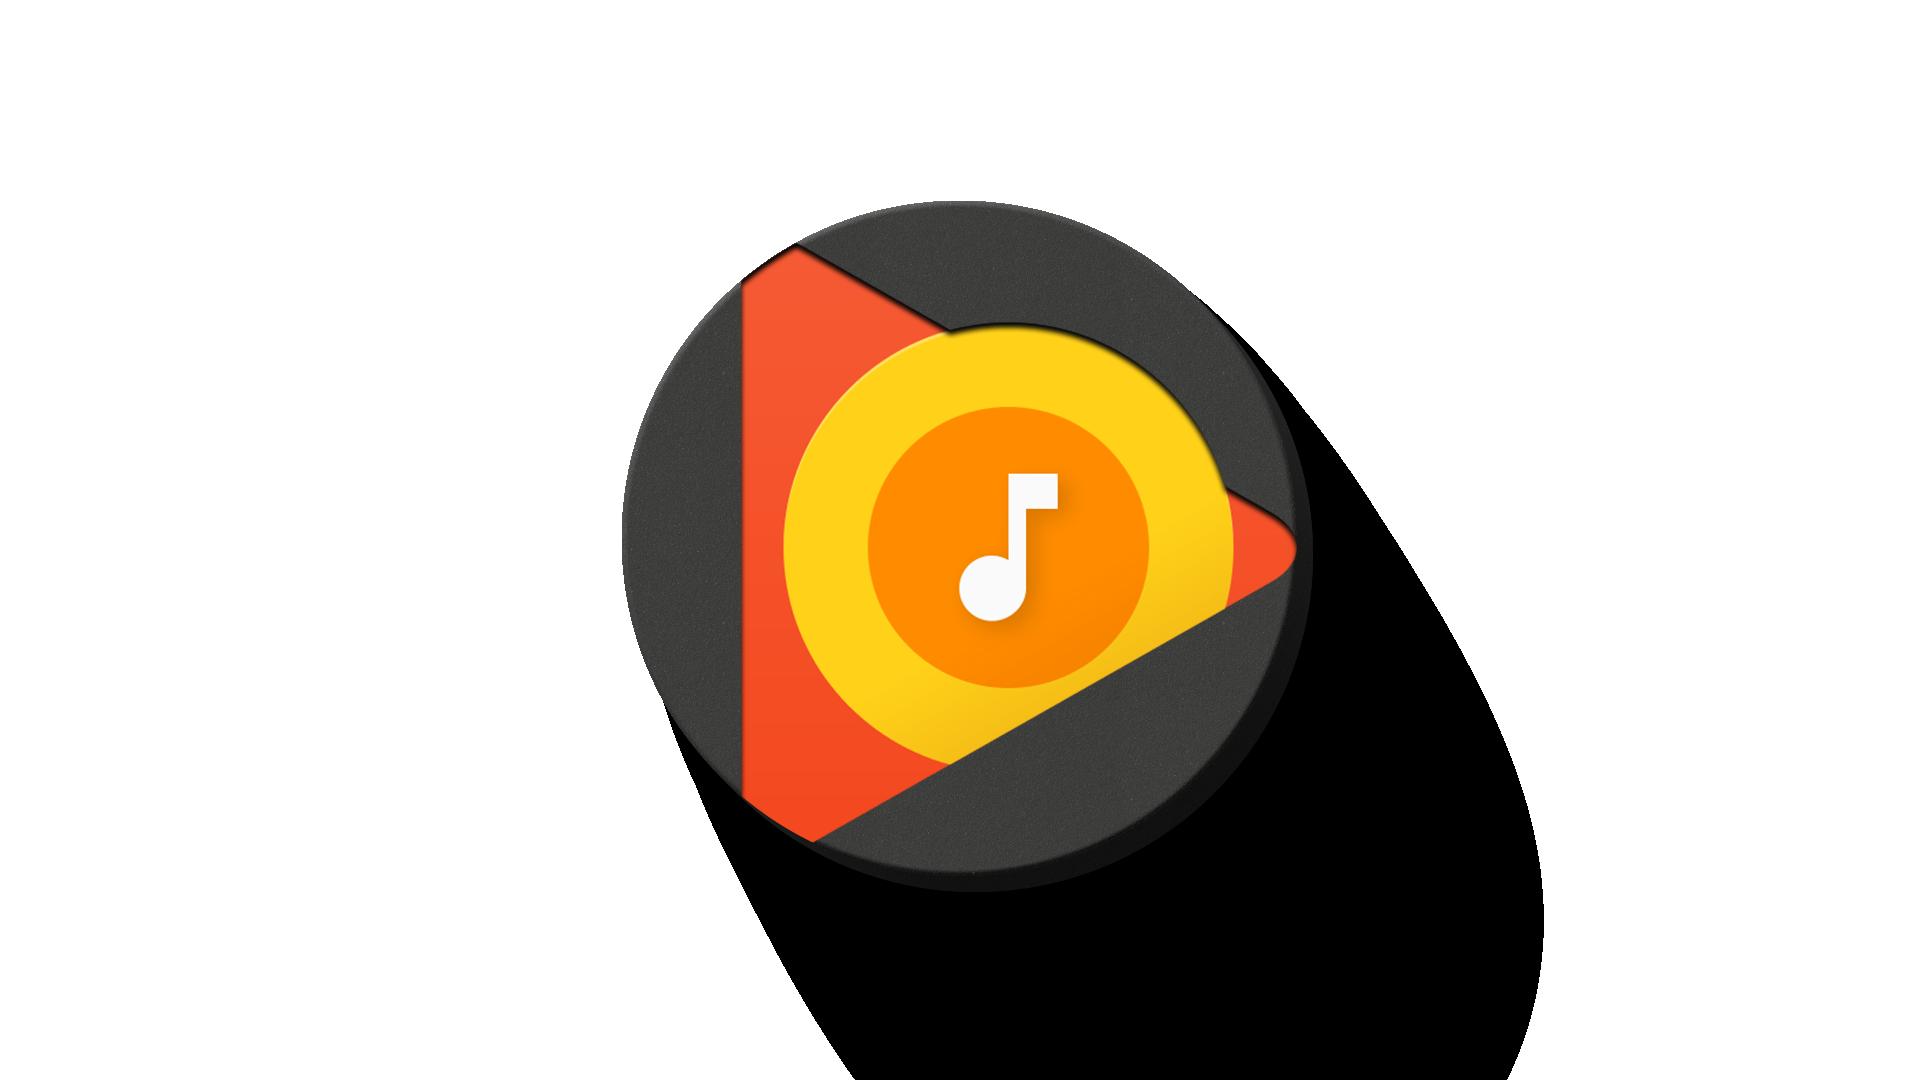 Click to Subsribe - Google Play Music